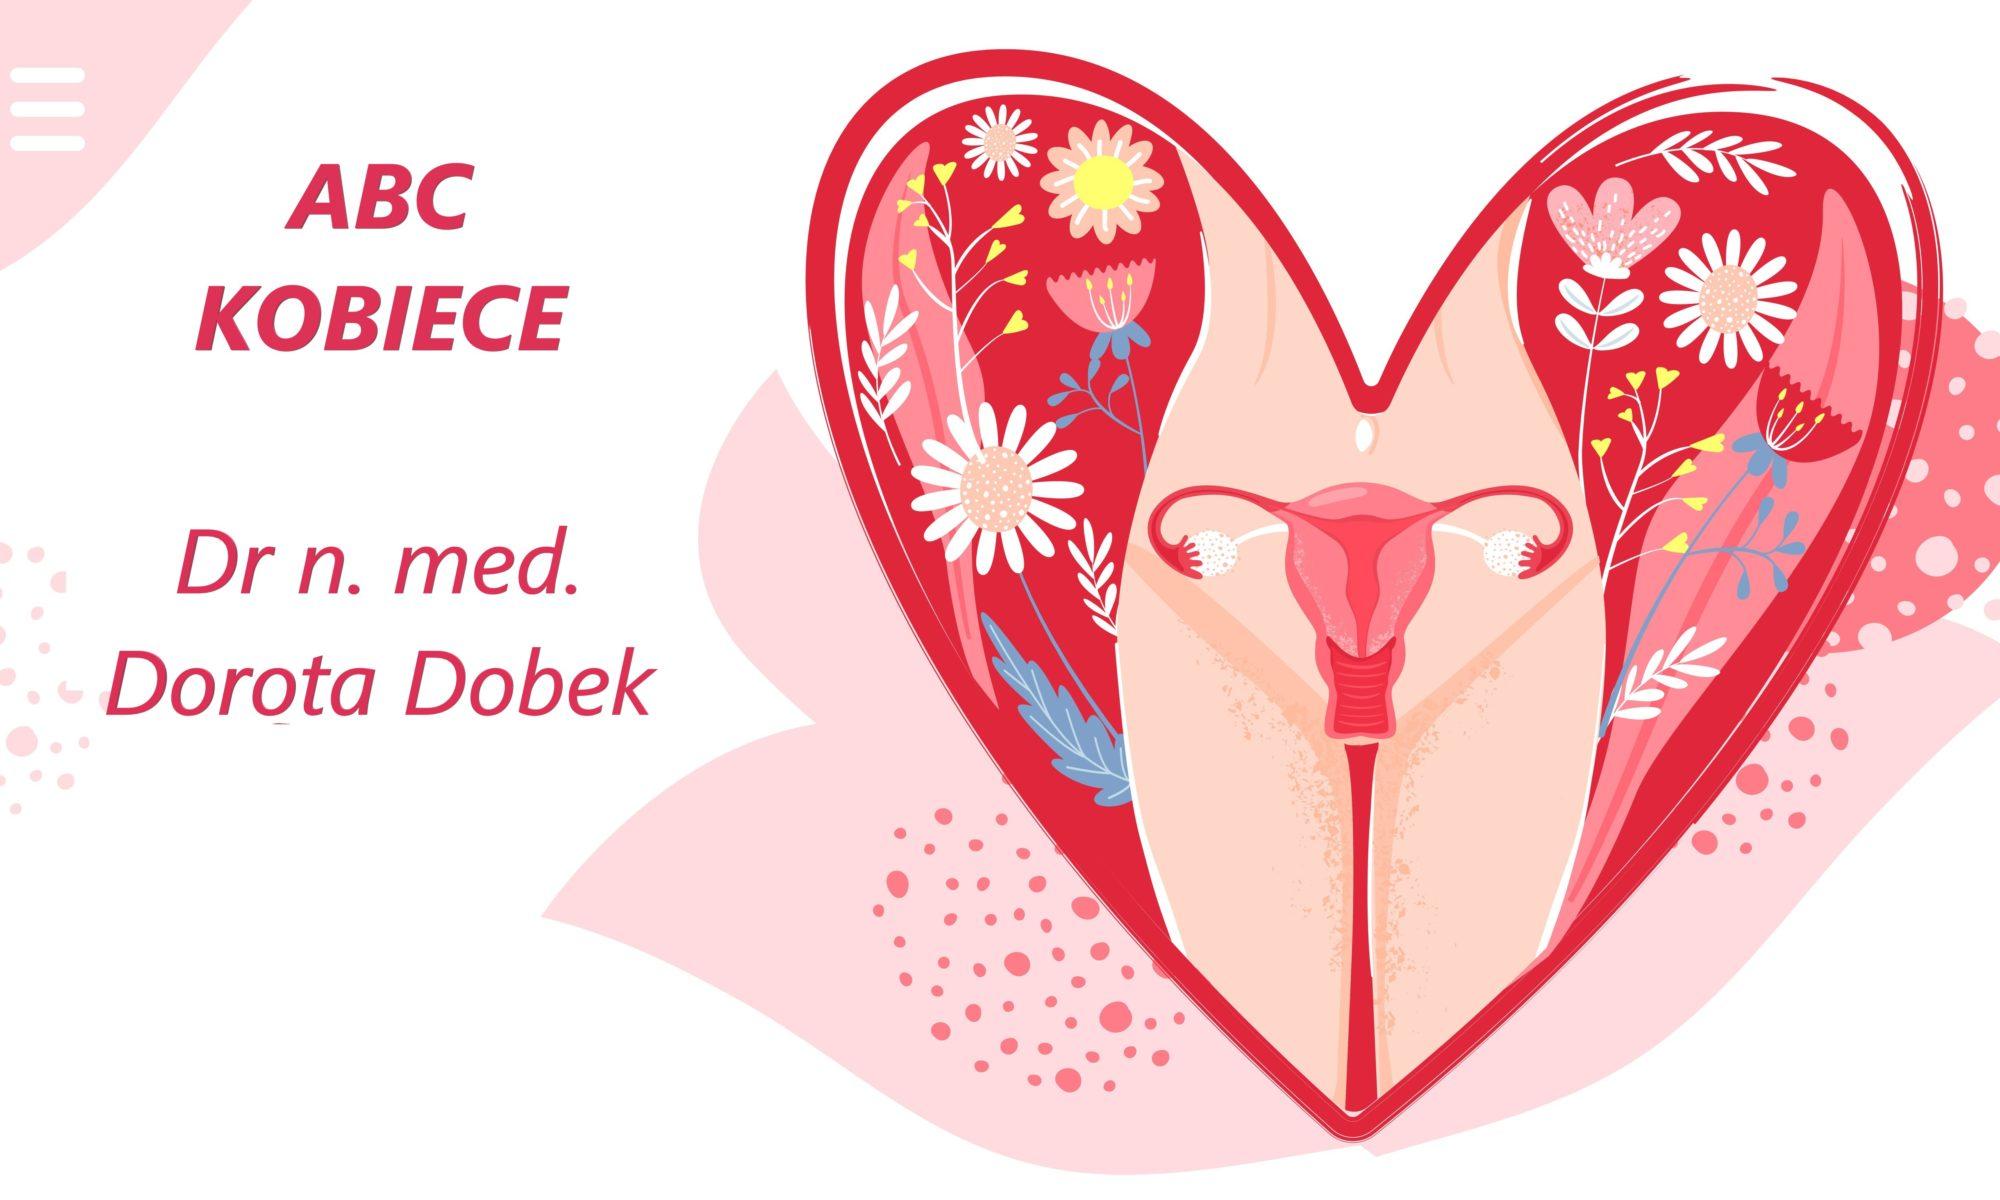 ABC Kobiece Dorota Dobek